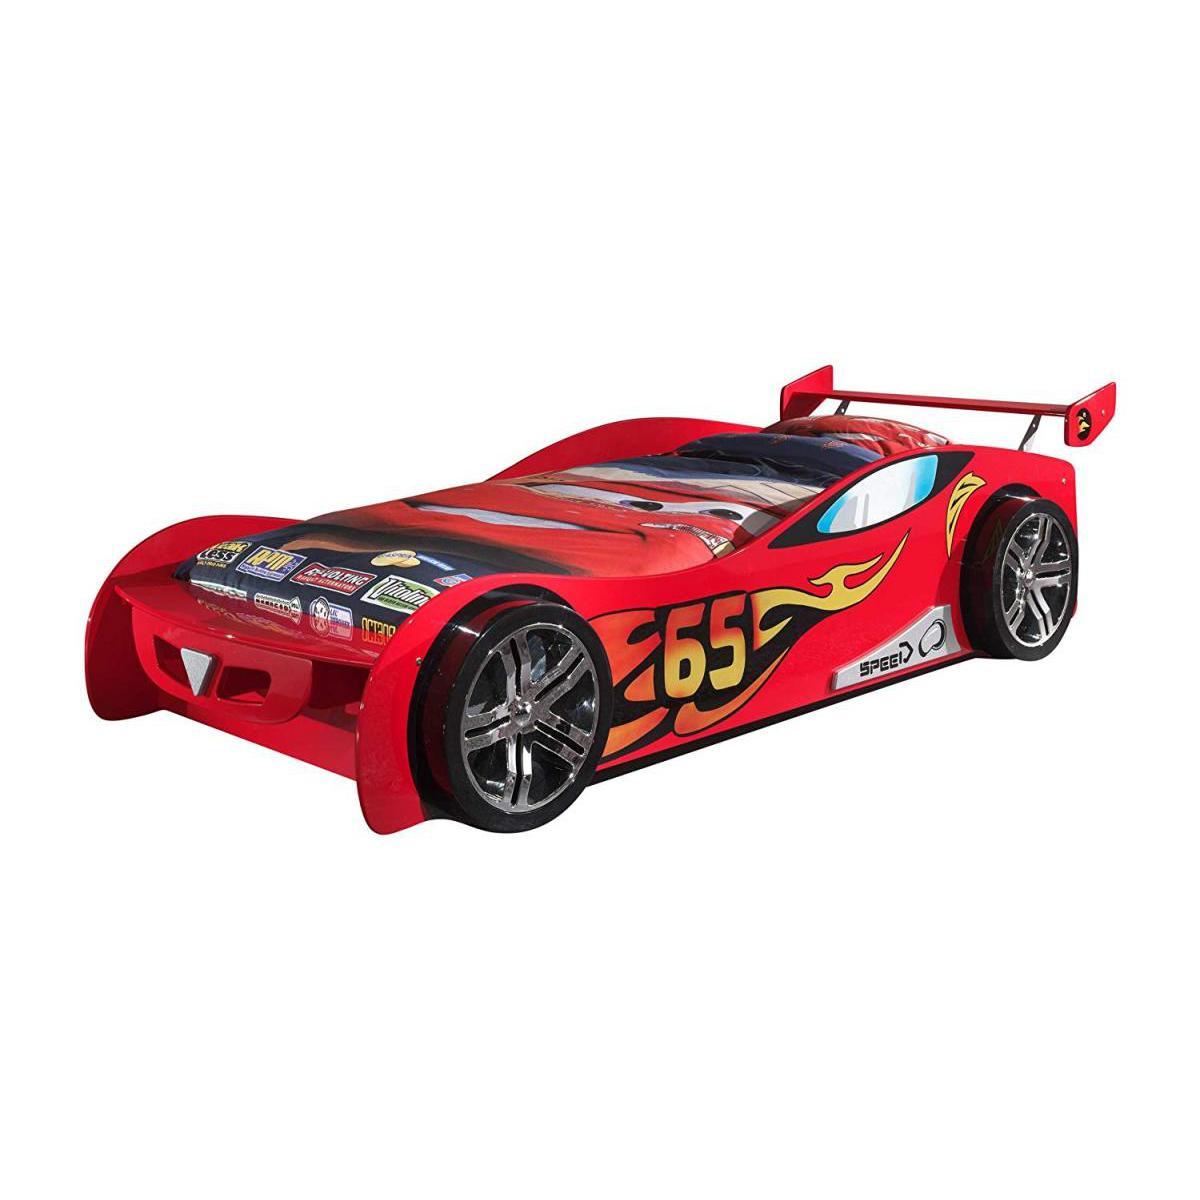 Vipack Vipack Funbeds Lit voiture Le Mans rouge